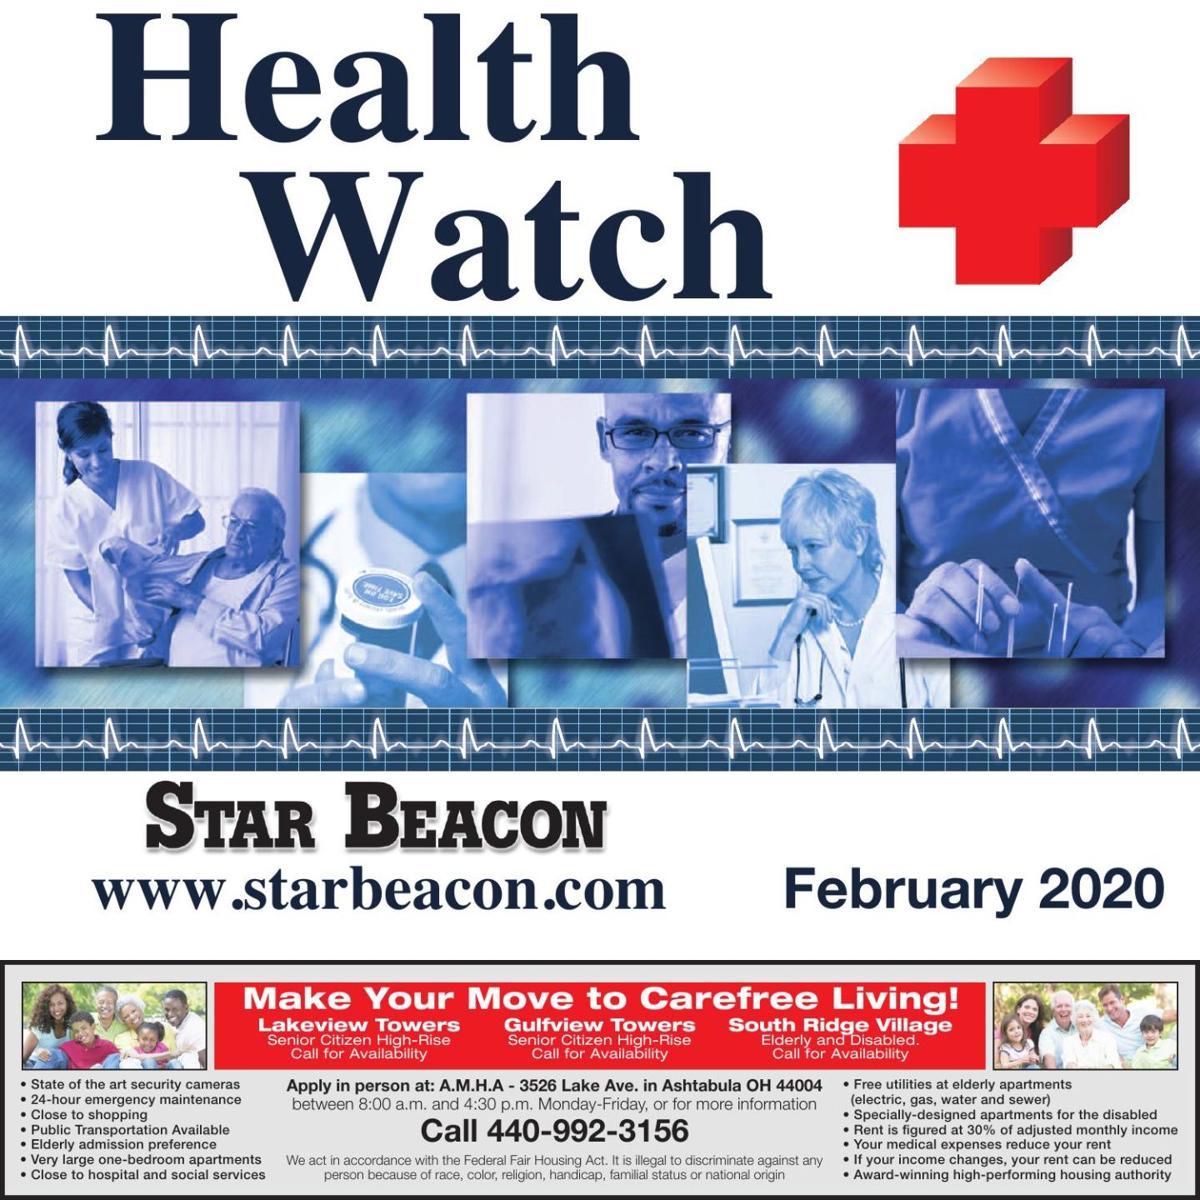 HEALTH WATCH - February 24, 2020